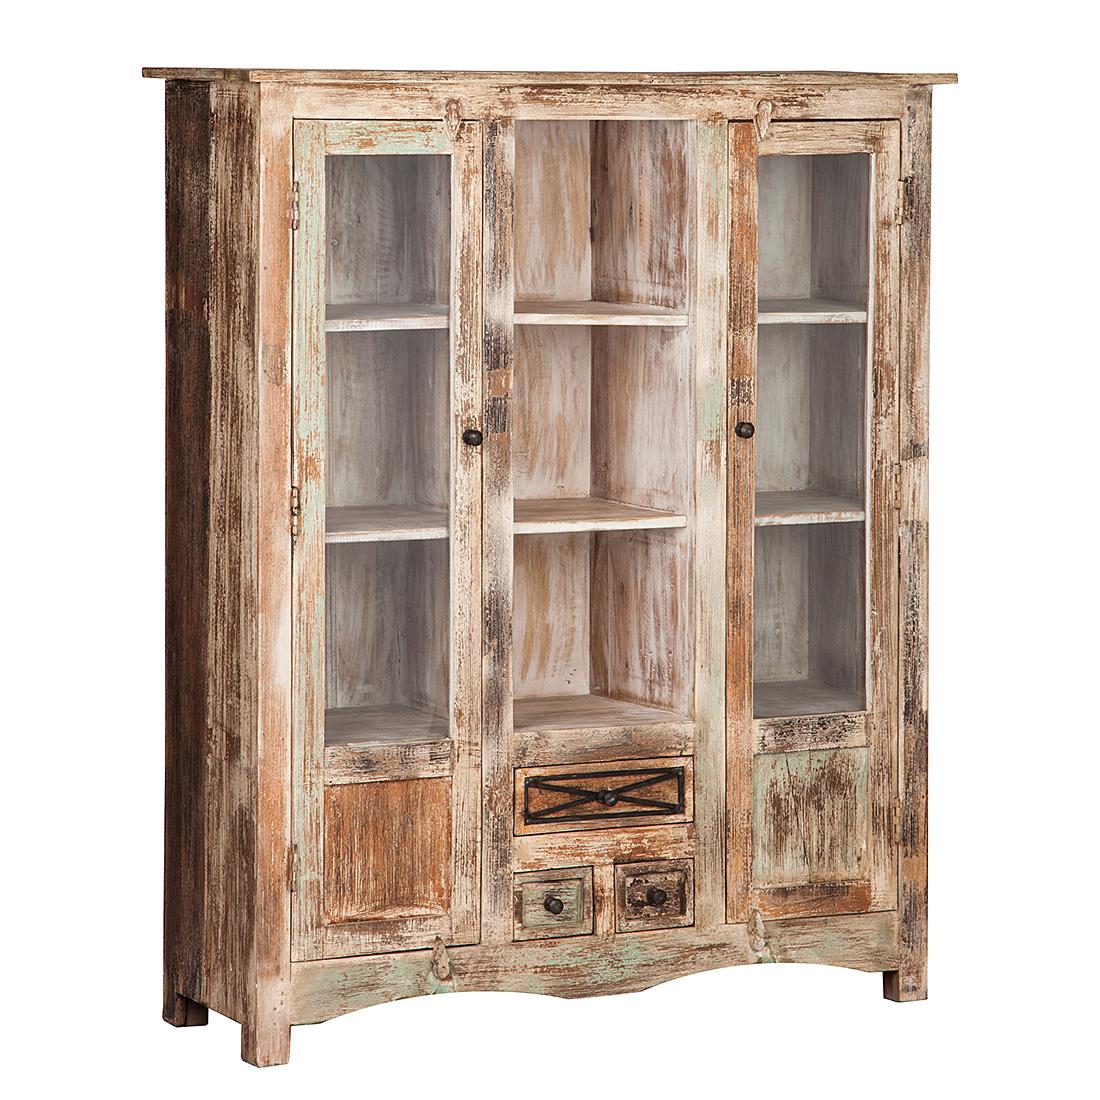 hochkommode mango holz esszimmer schrank buffet vitrine highboard vintage neu ebay. Black Bedroom Furniture Sets. Home Design Ideas